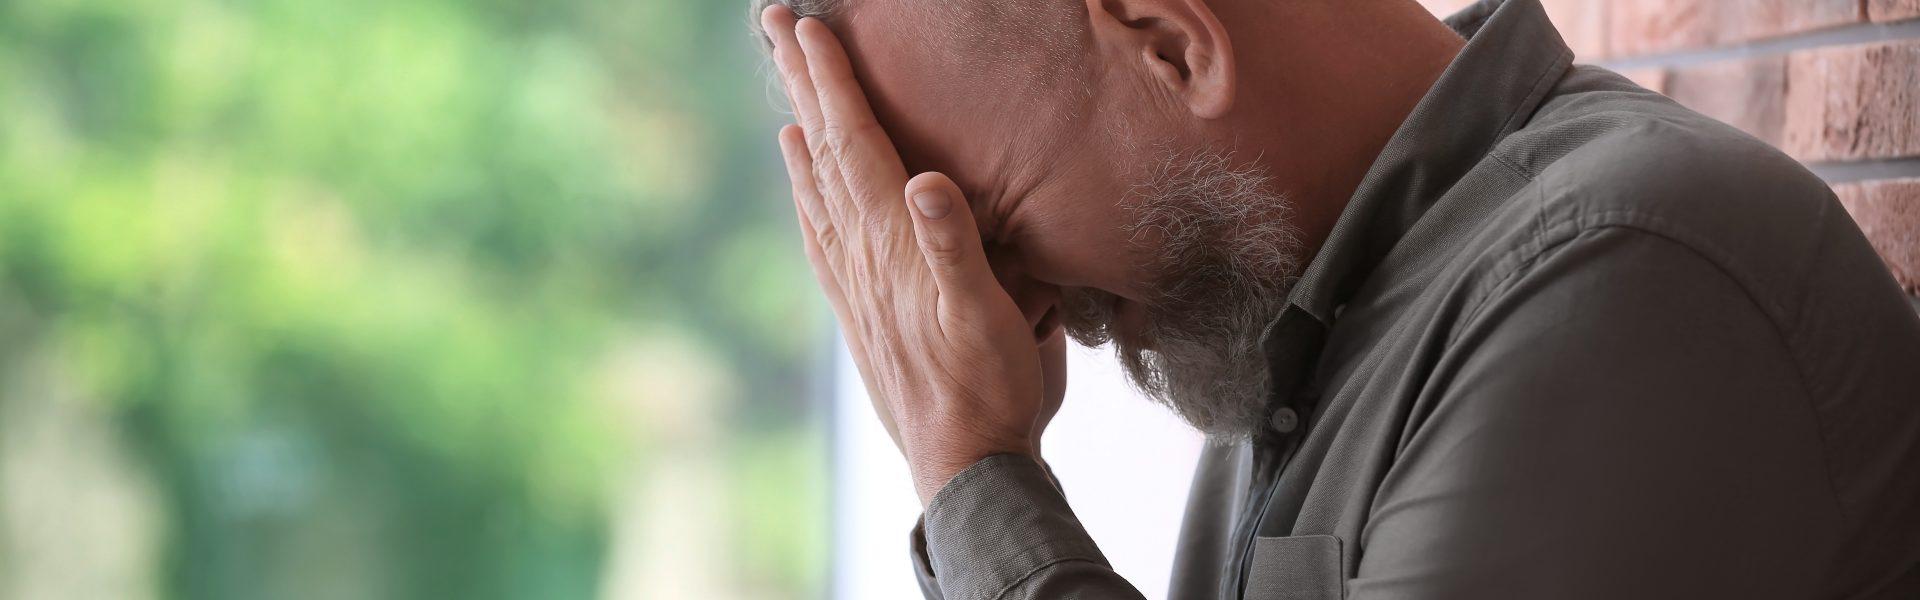 Mental health issues in men